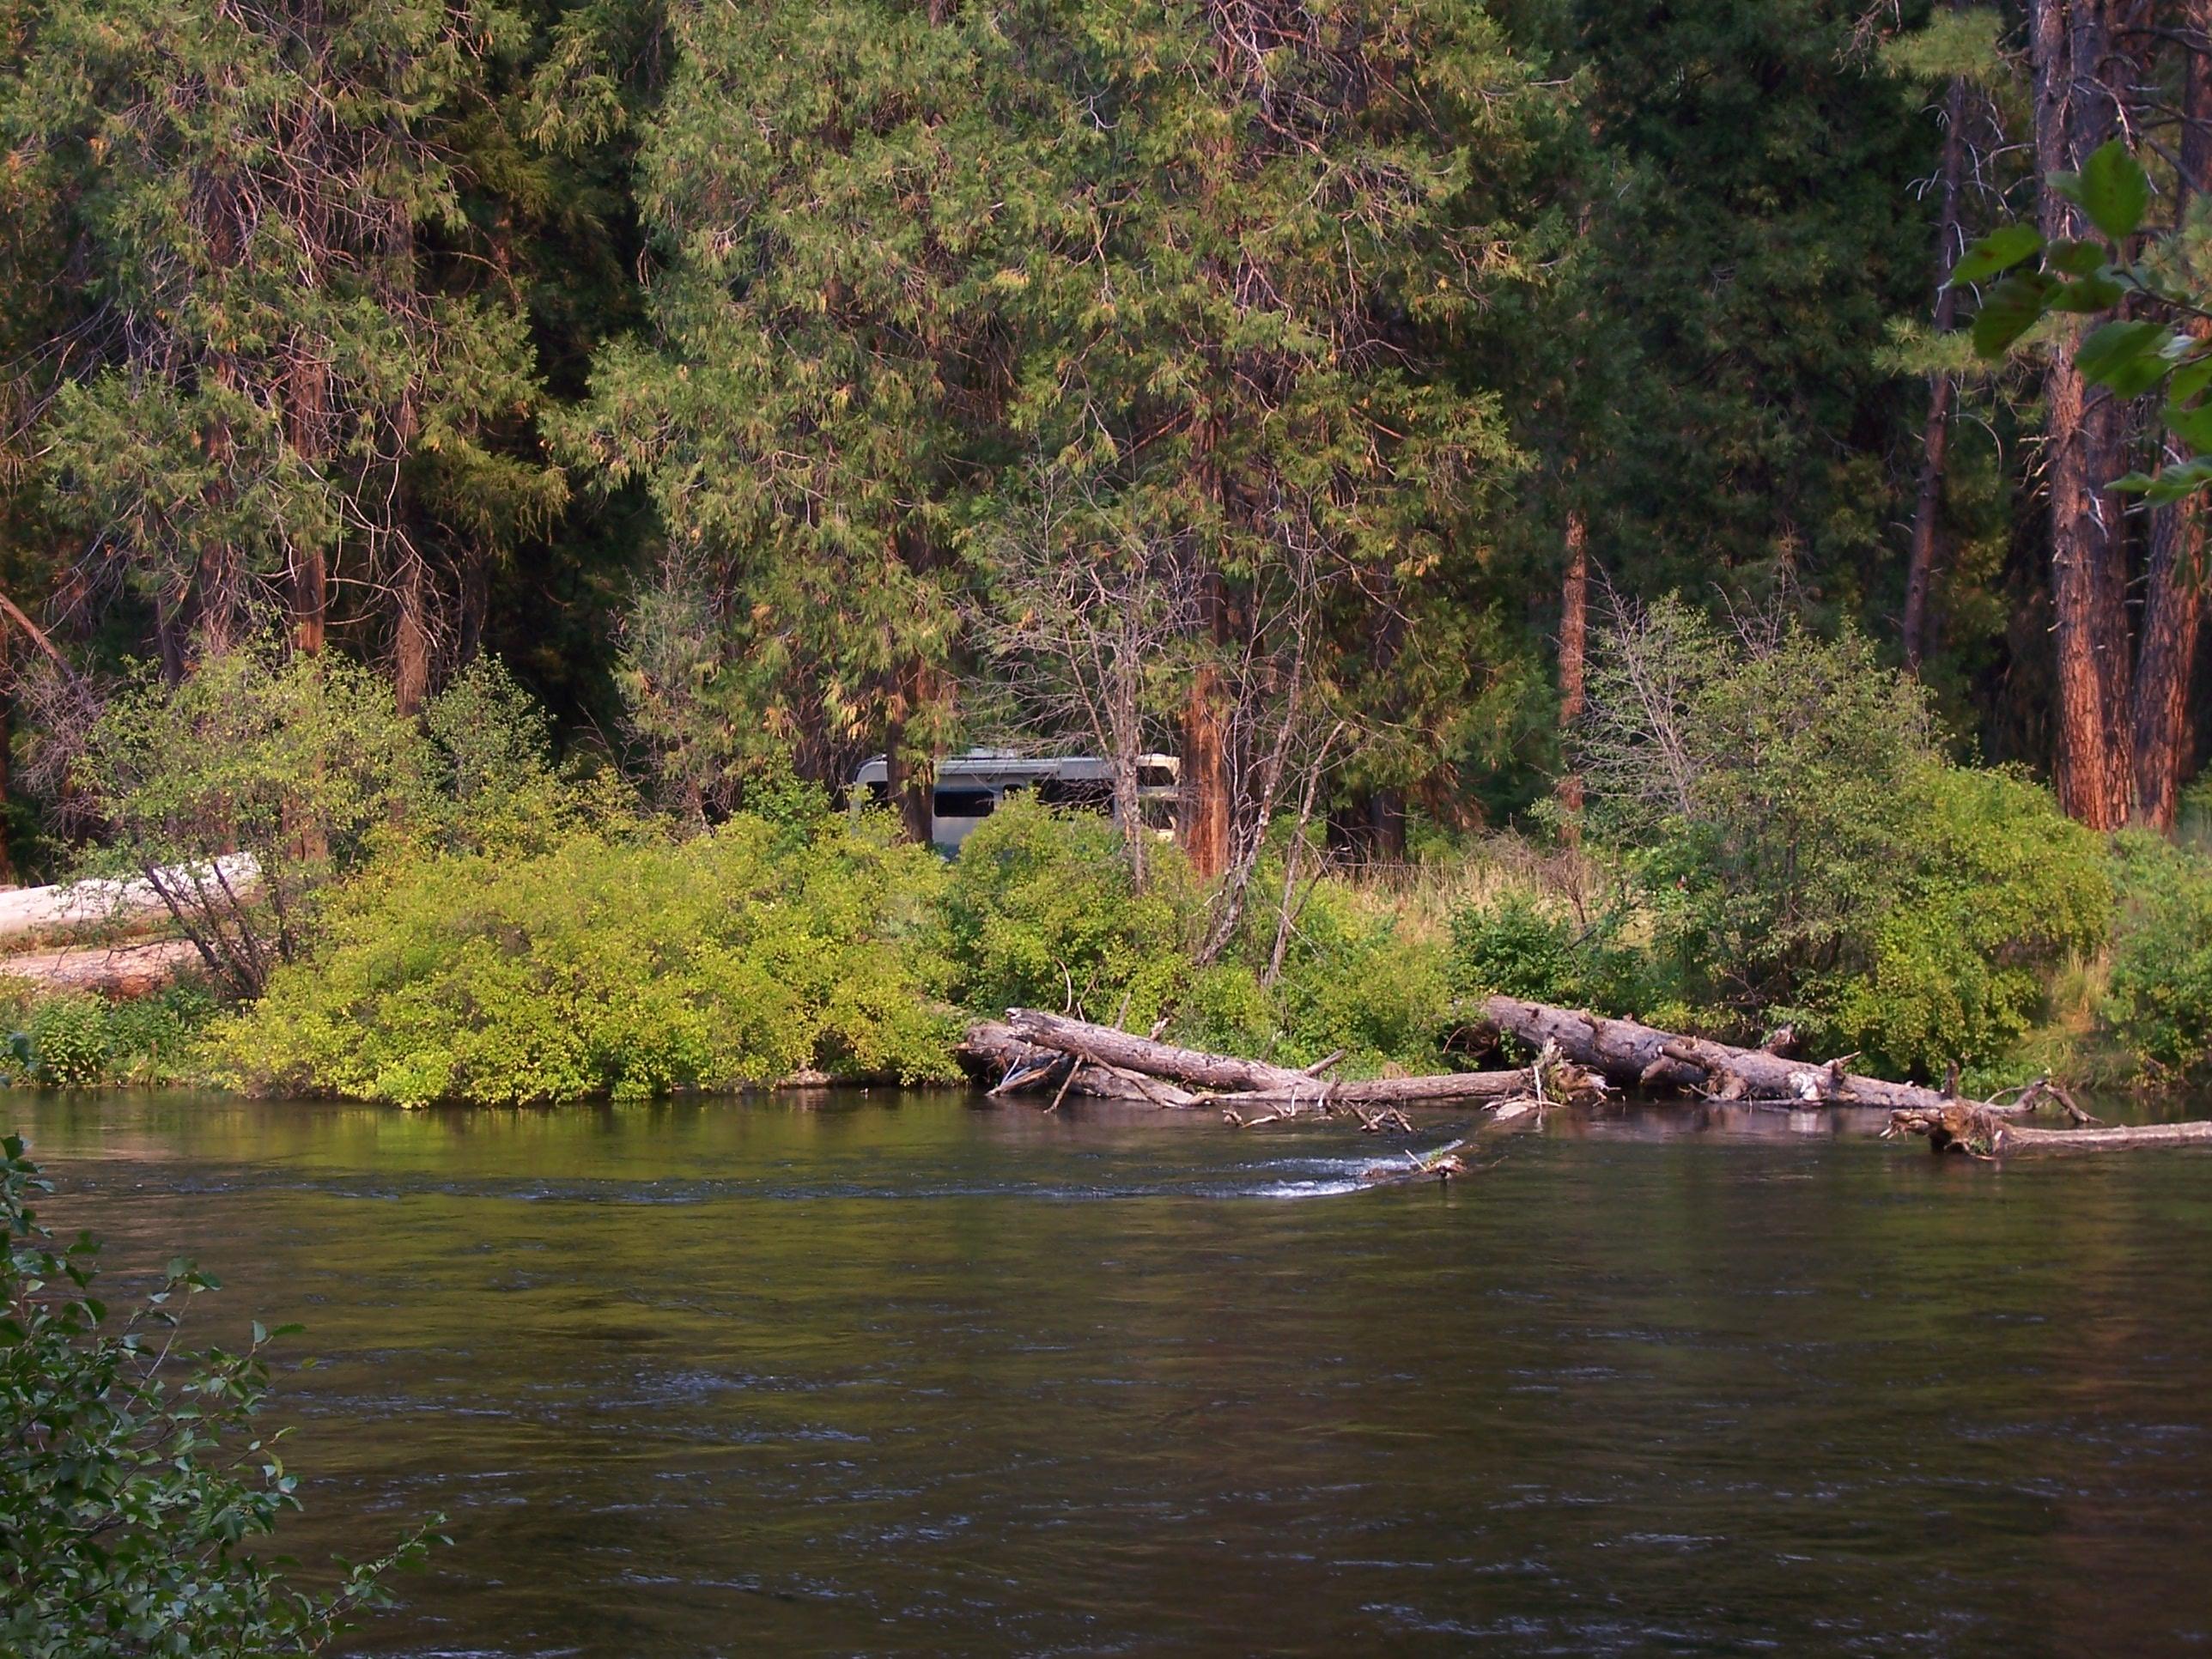 Blanco state park jimbo 39 s journeys for Blanco state park fishing